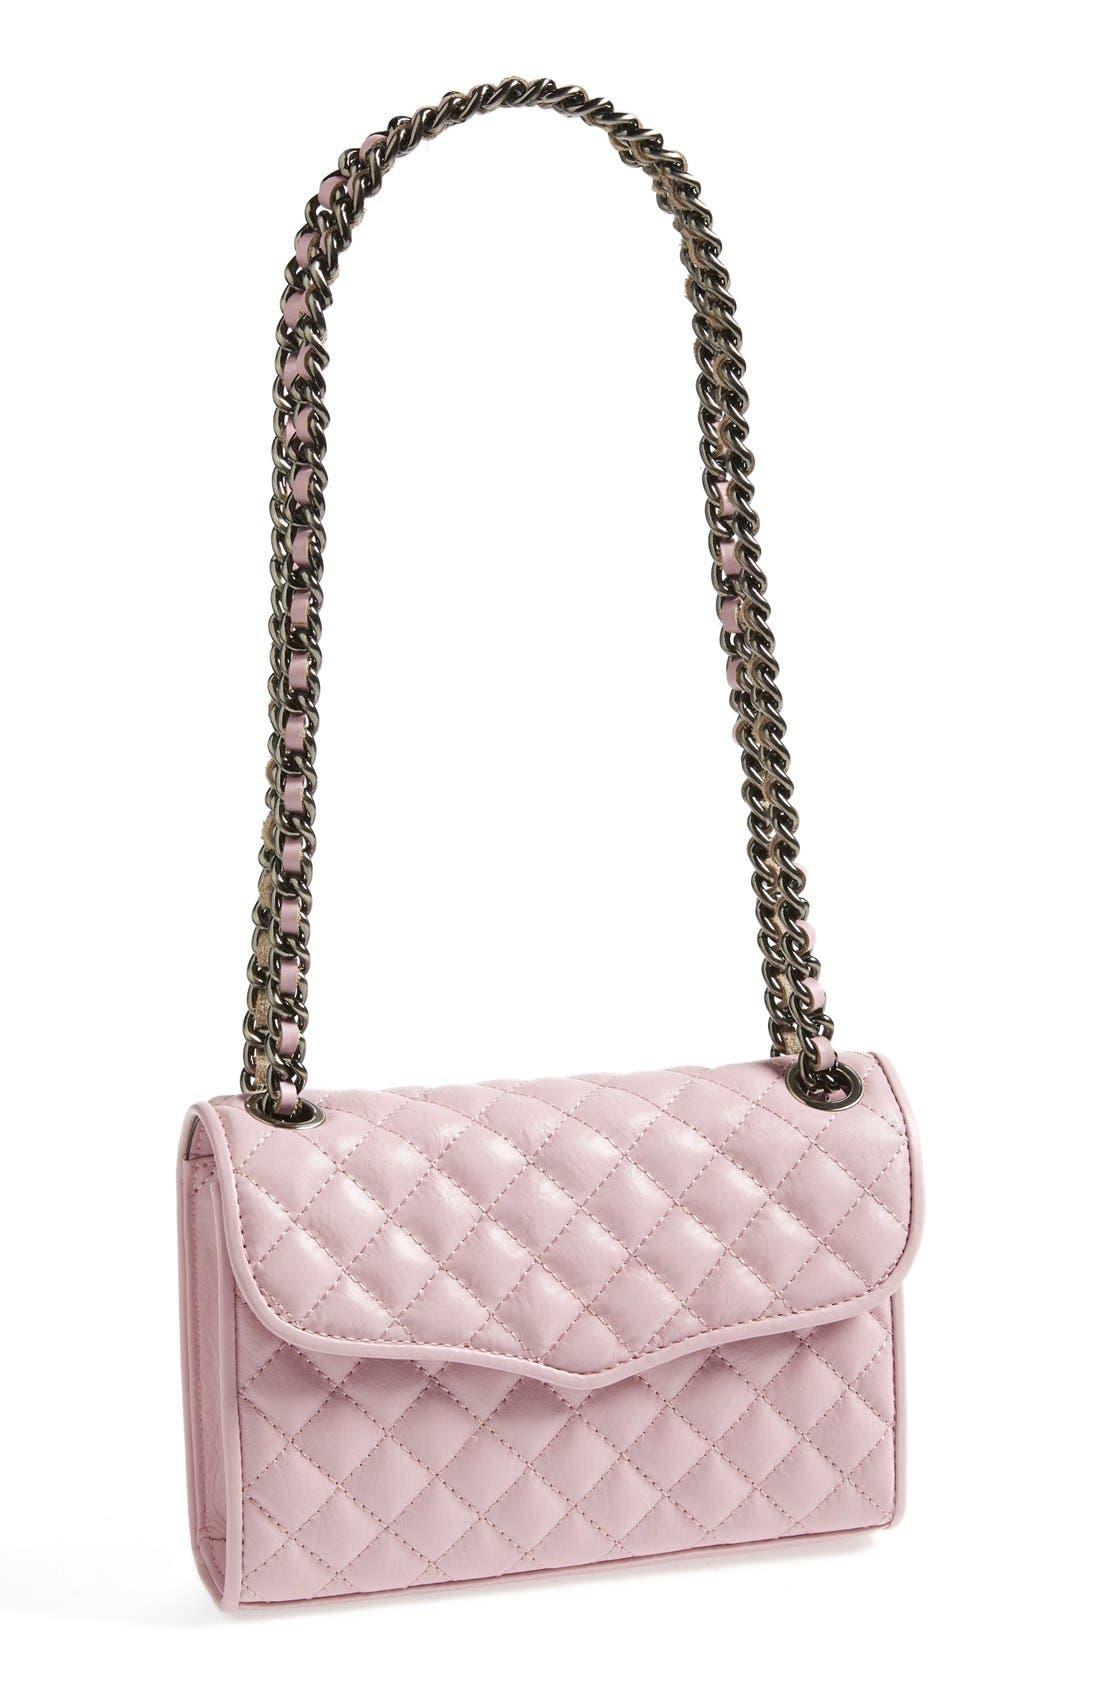 Main Image - Rebecca Minkoff 'Mini Quilted Affair' Shoulder Bag